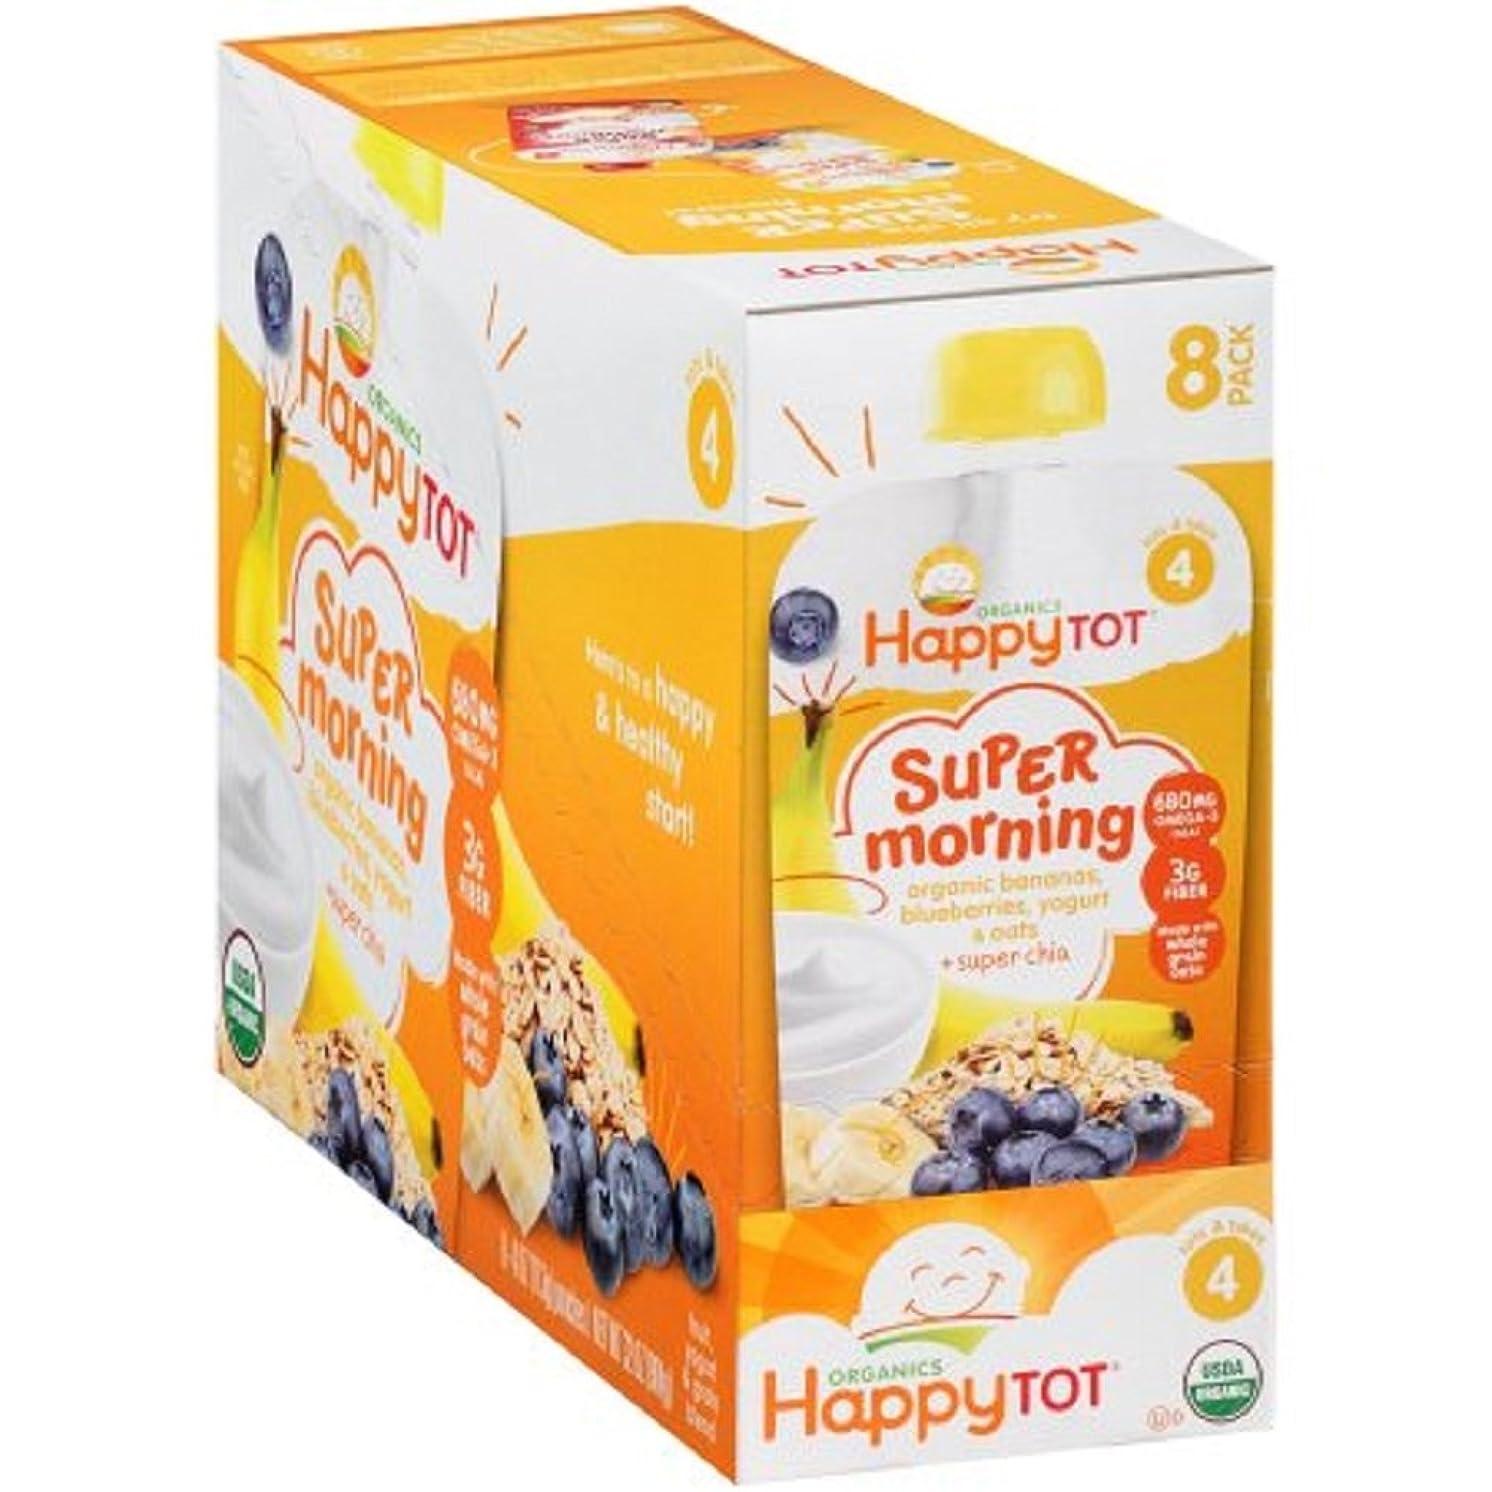 Happy Tot Organics Super Morning Bananas, Blueberries, Yogurt & Oats + Super Chia Organic Stage 4 Baby Food, 4 oz, 8 count